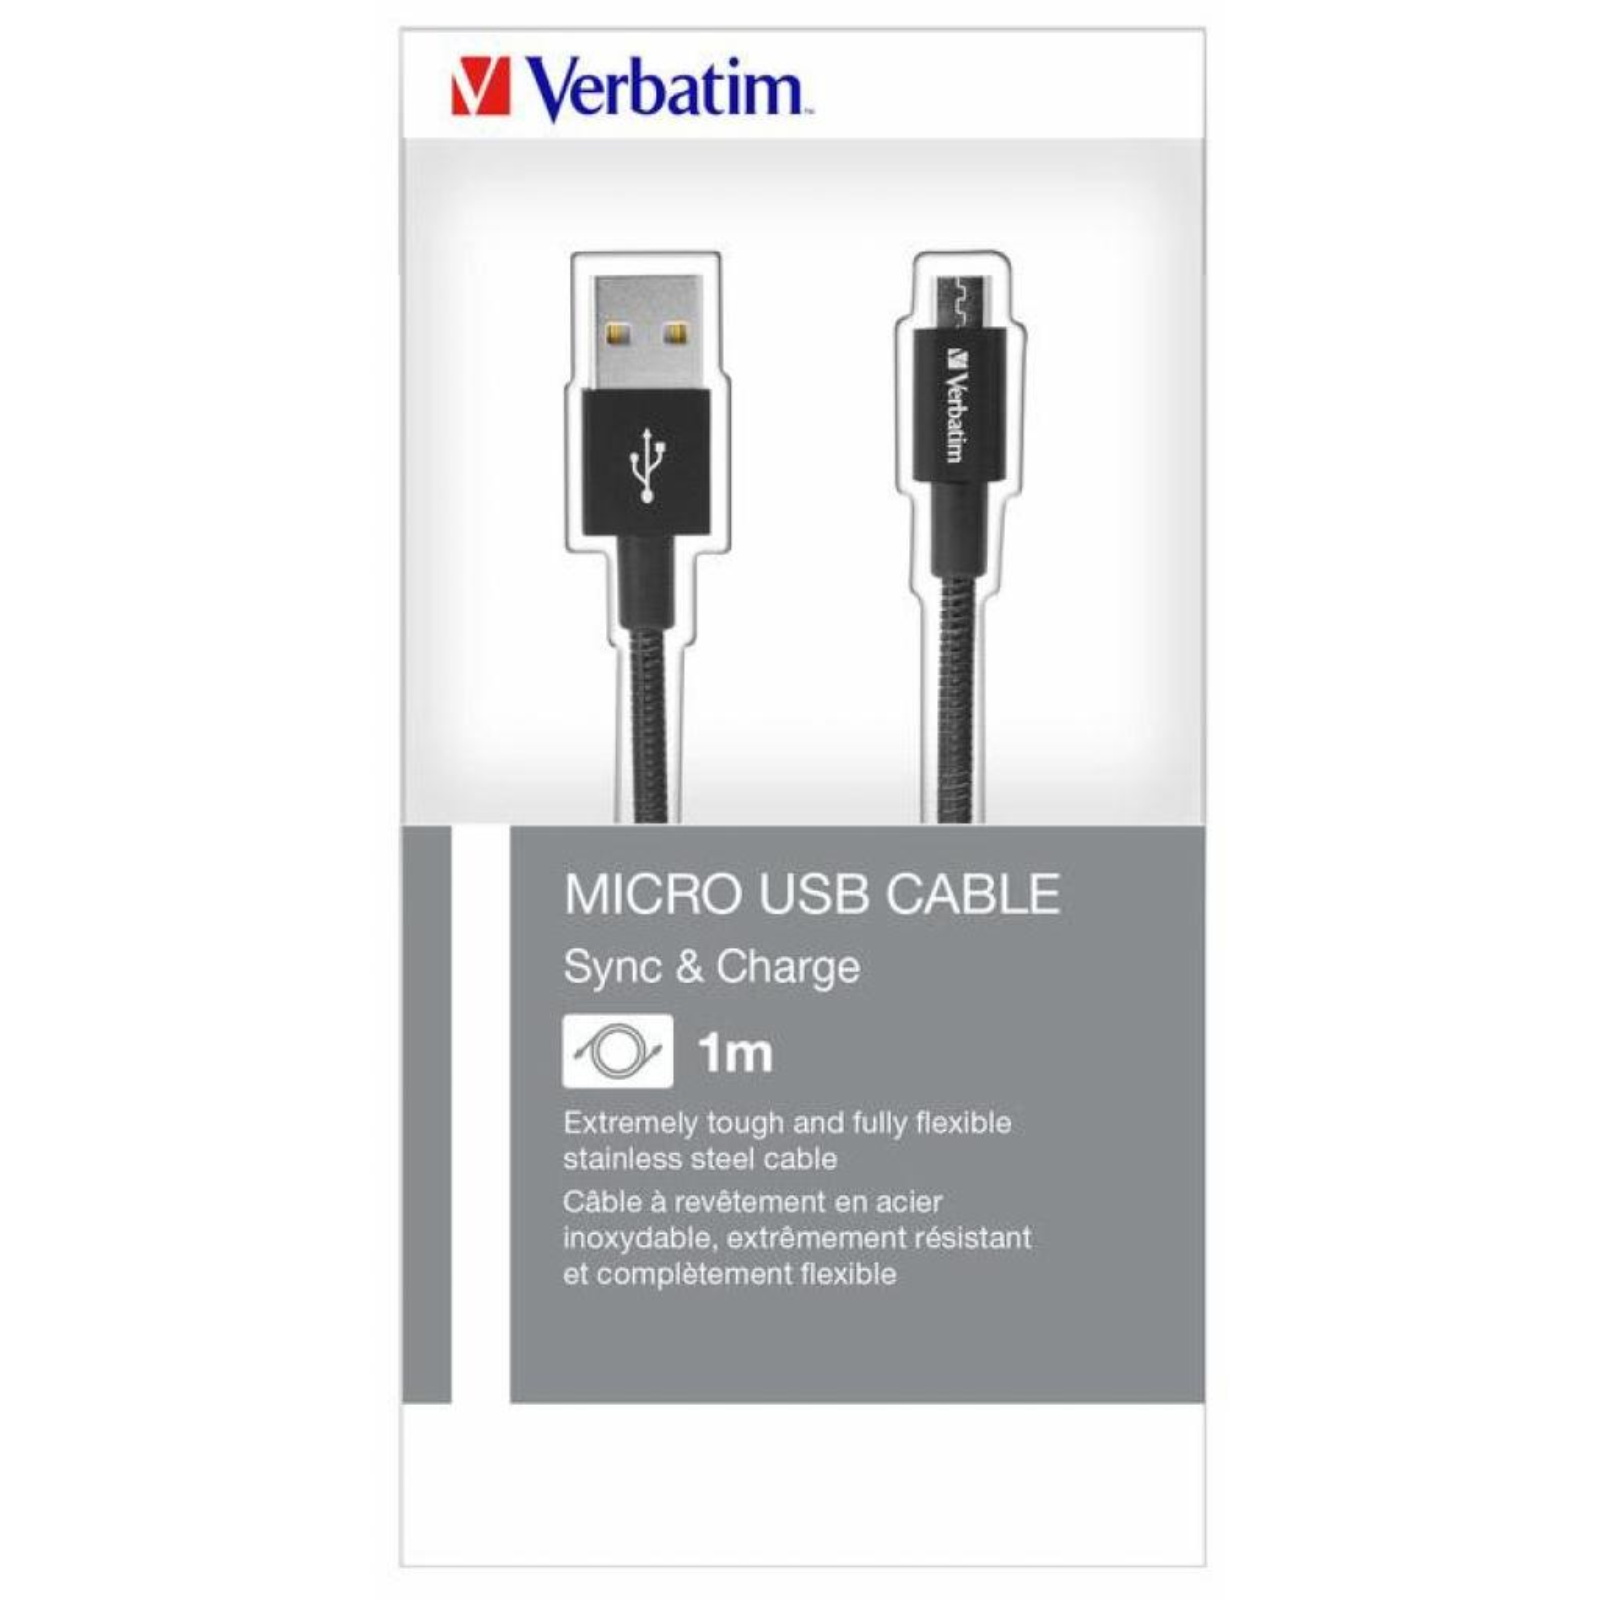 Дата кабель USB 2.0 AM to Micro 5P 1.0m black Verbatim (48863) изображение 7